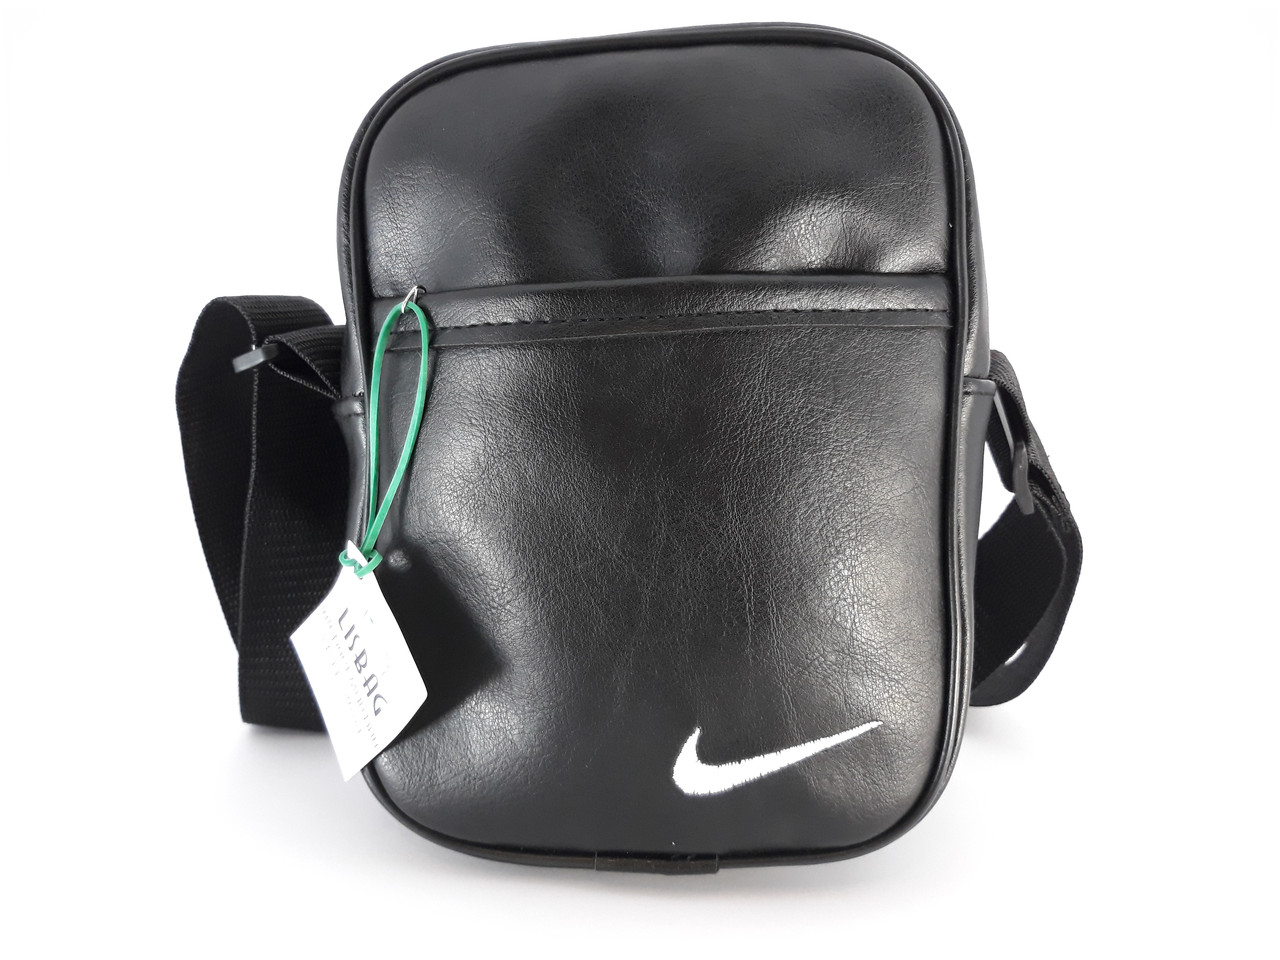 5b5f9eb3d338 Мужская сумка планшетка/мессенджер через плечо копия Nike , черная ...